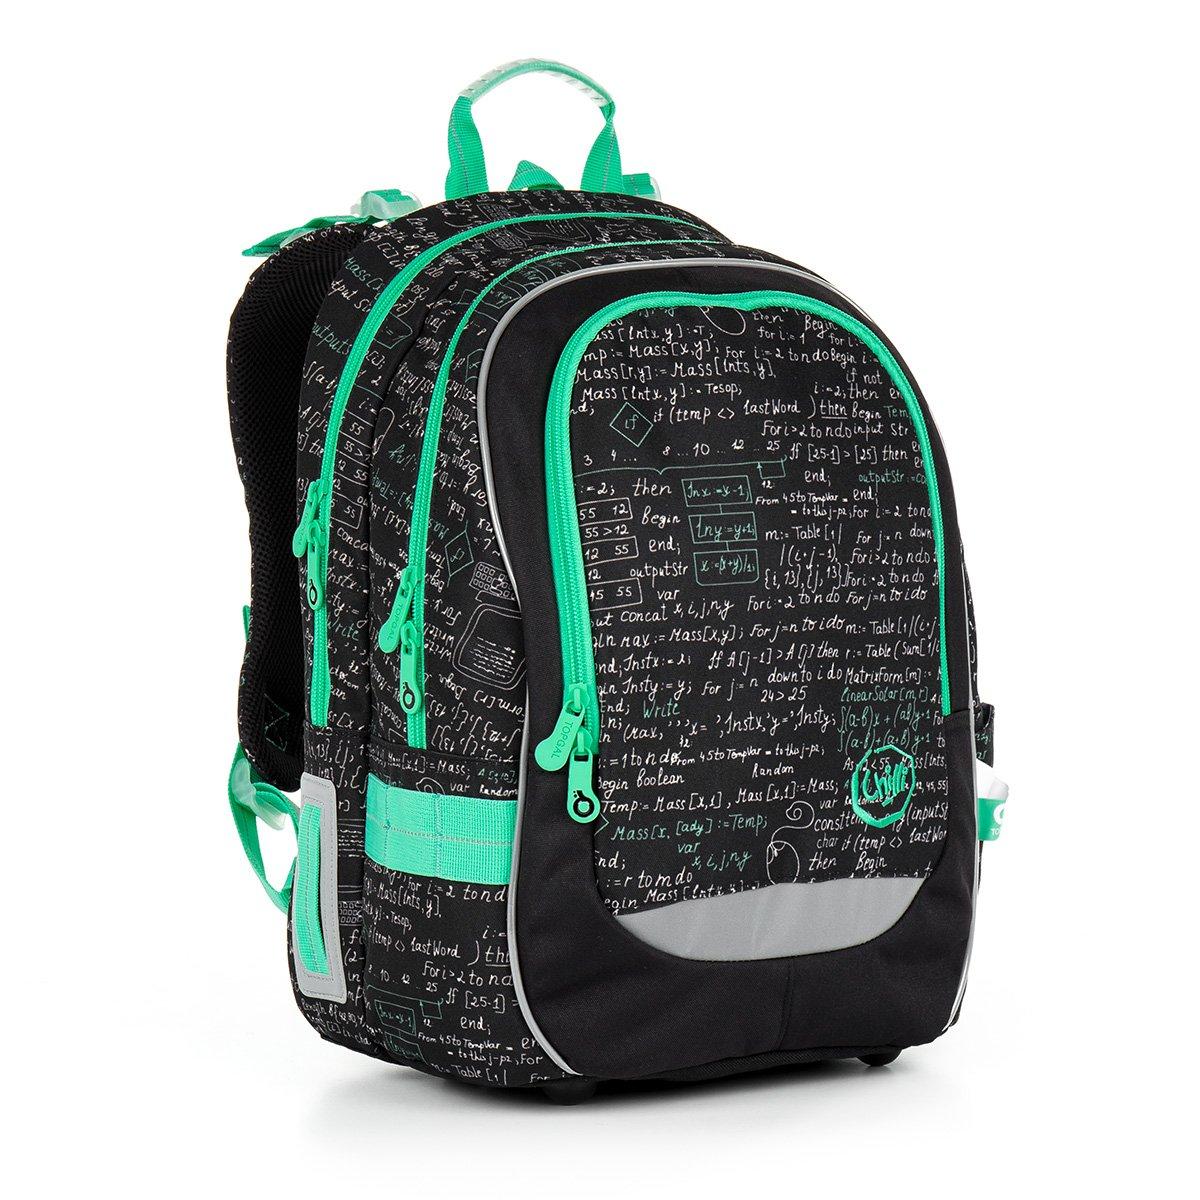 d794a520d61 Školní batoh Topgal CHI 866 A - Black